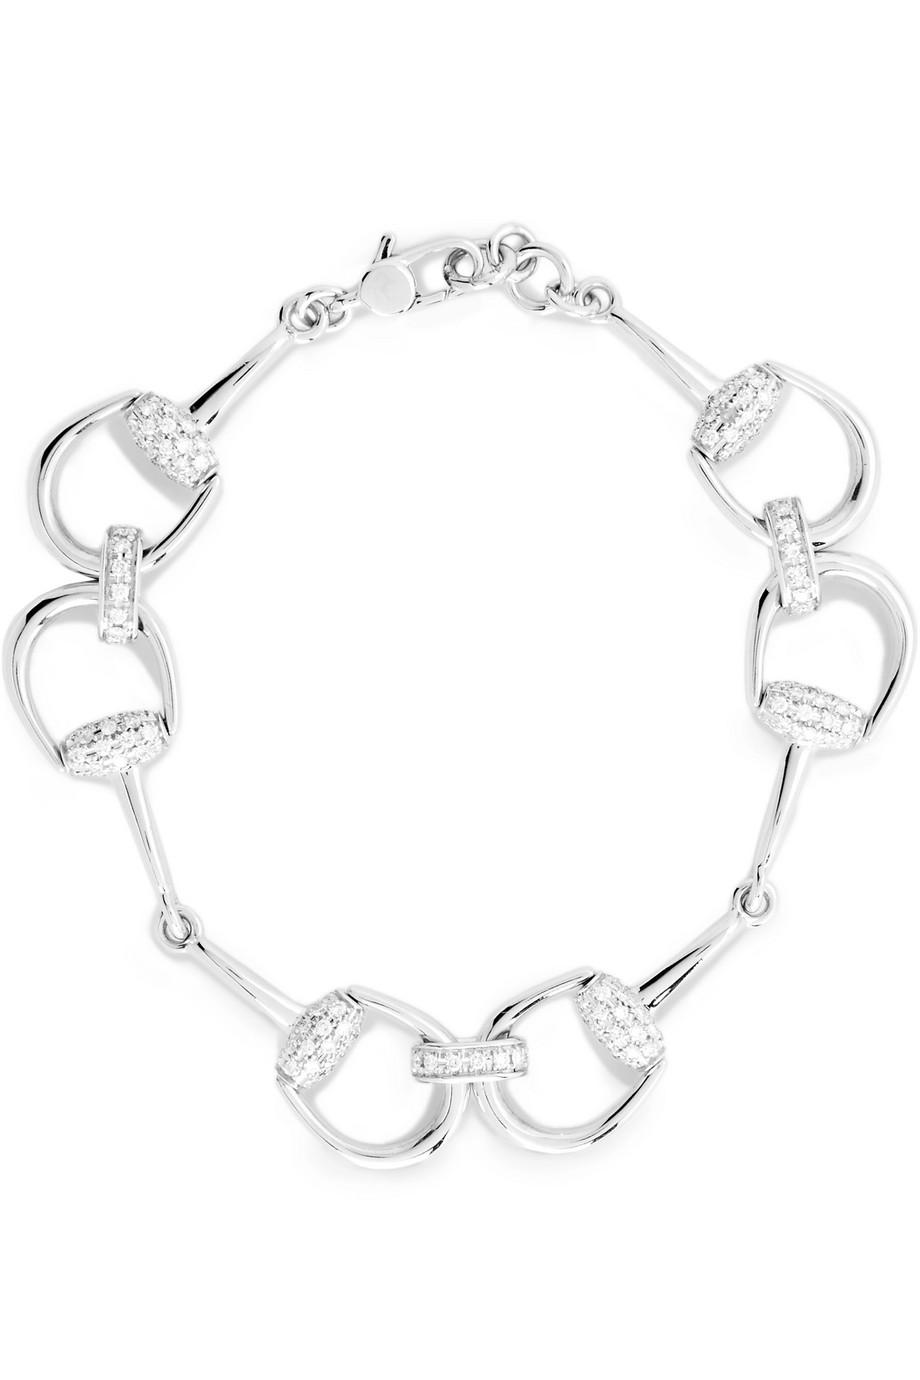 Gucci 18-Karat White Gold Diamond Horsebit Bracelet, Women's